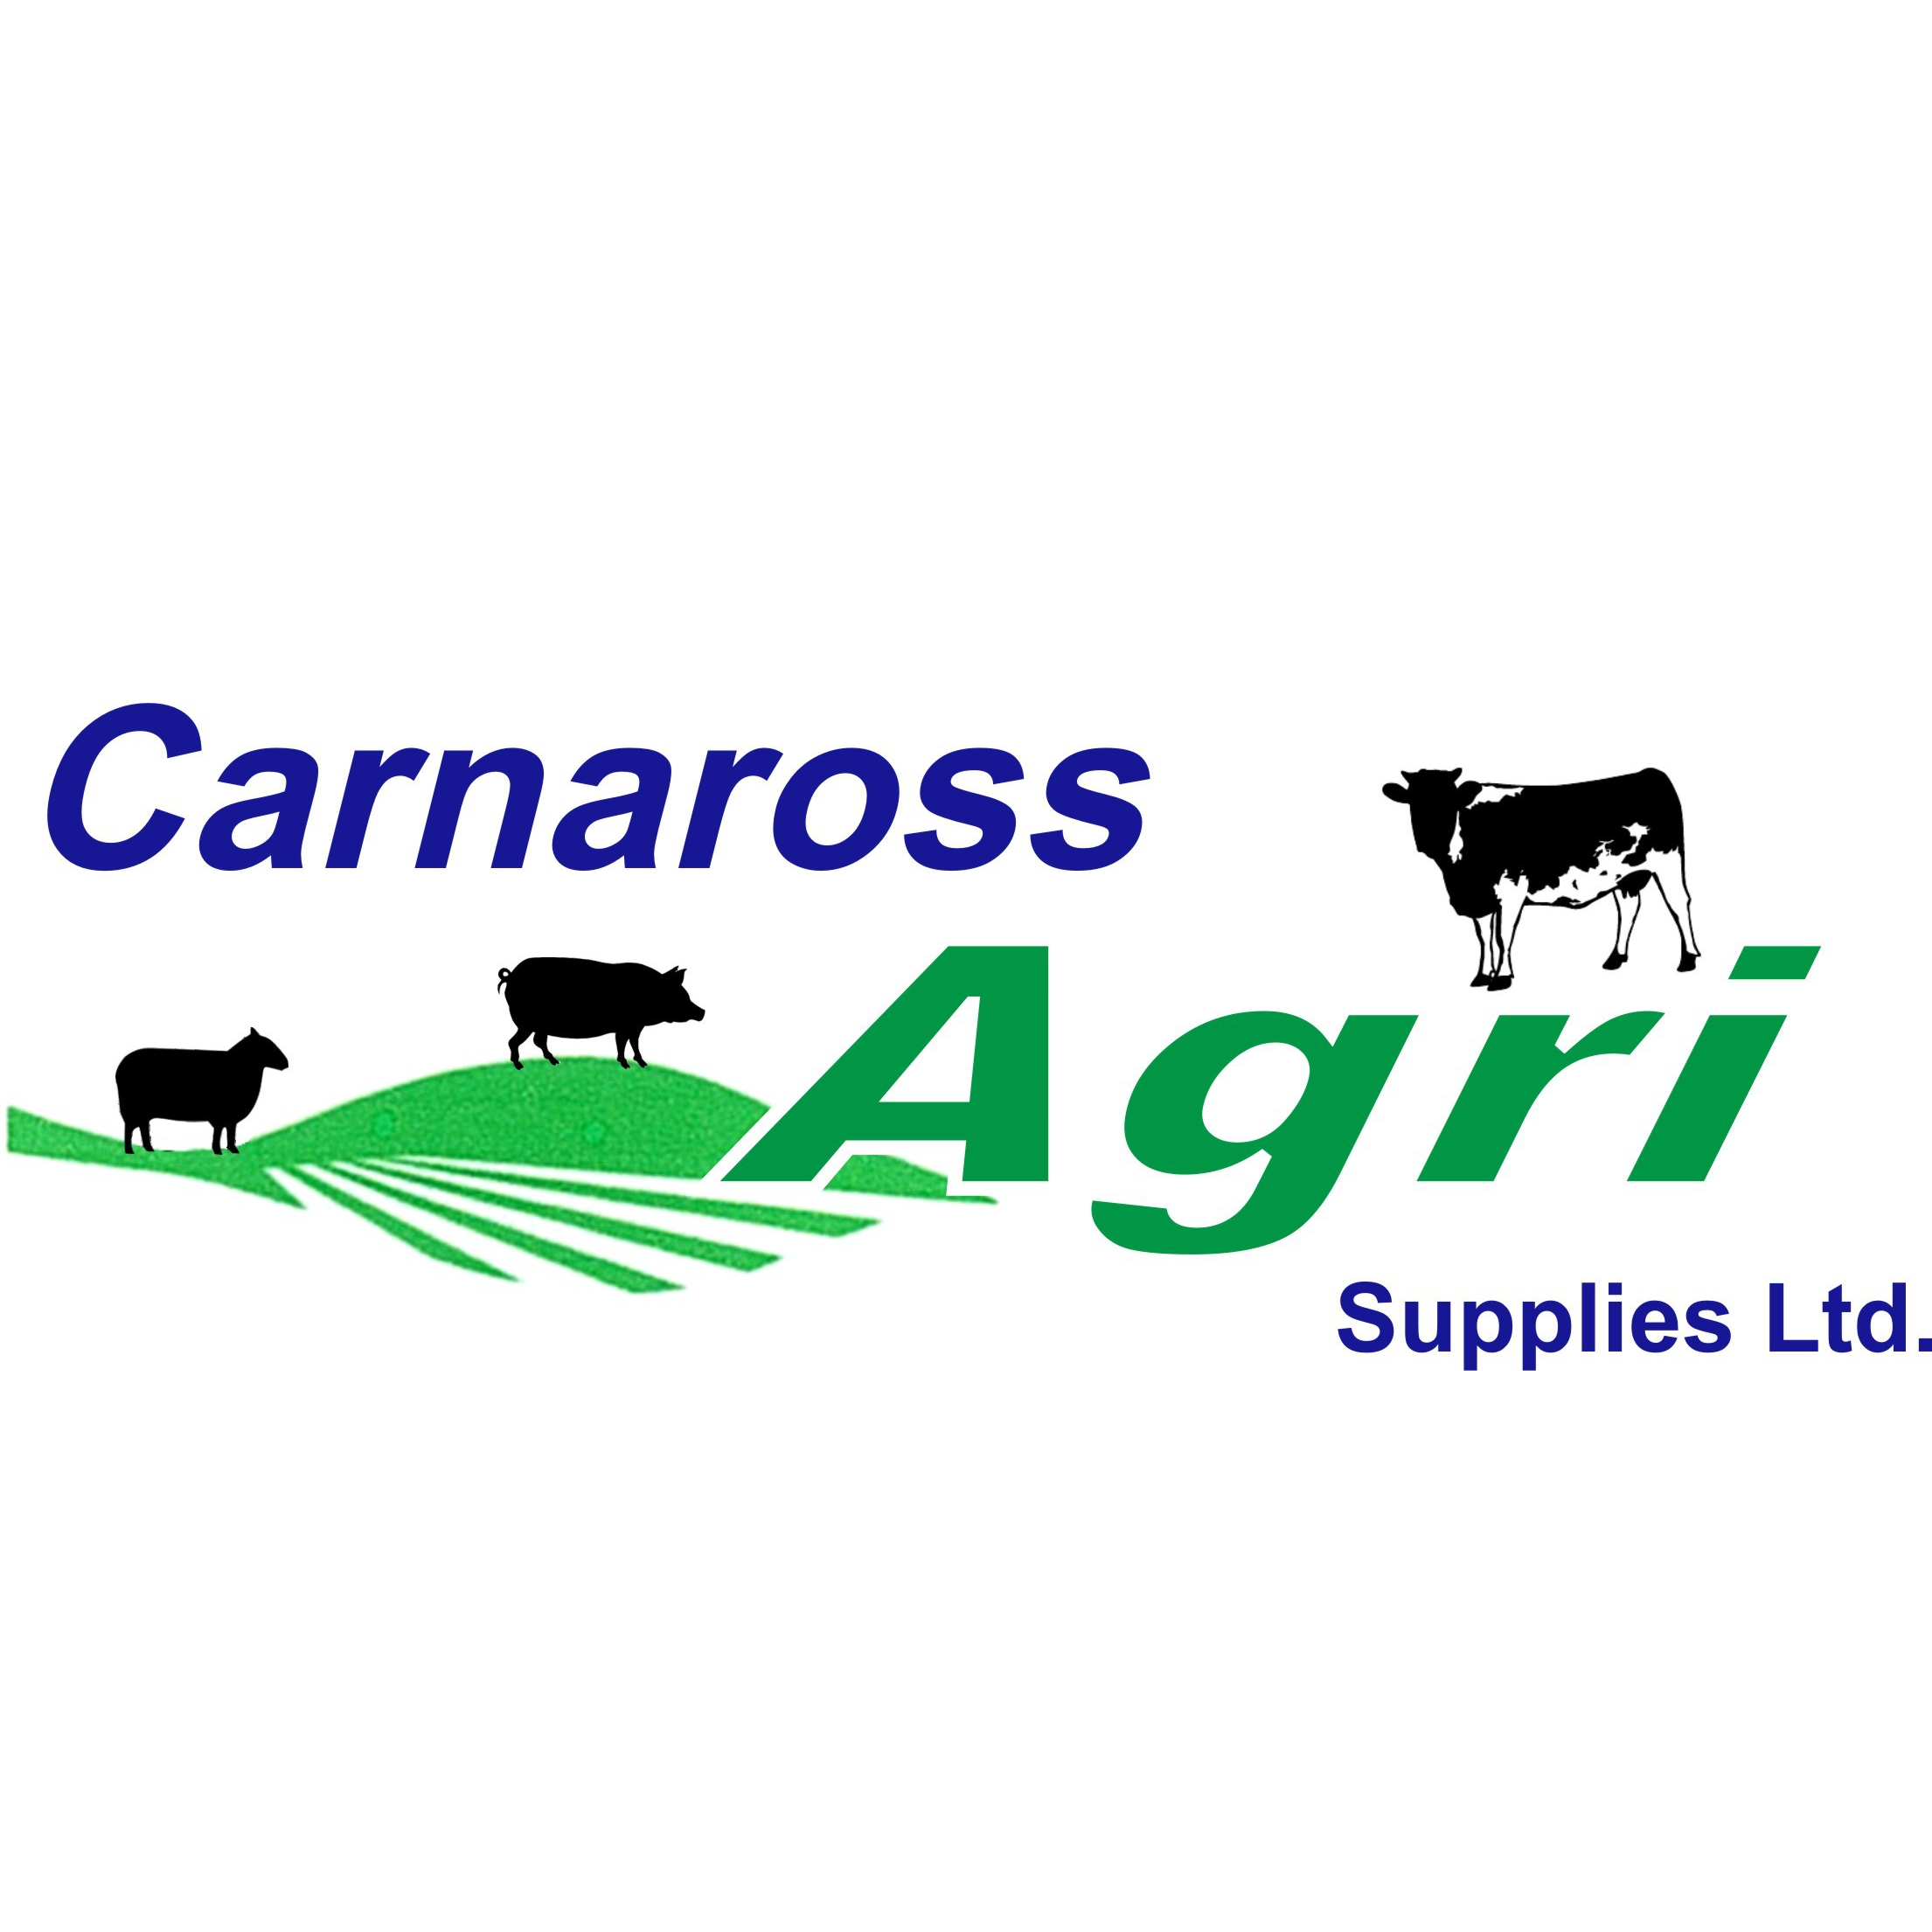 Carnaross Agri Supplies Ltd